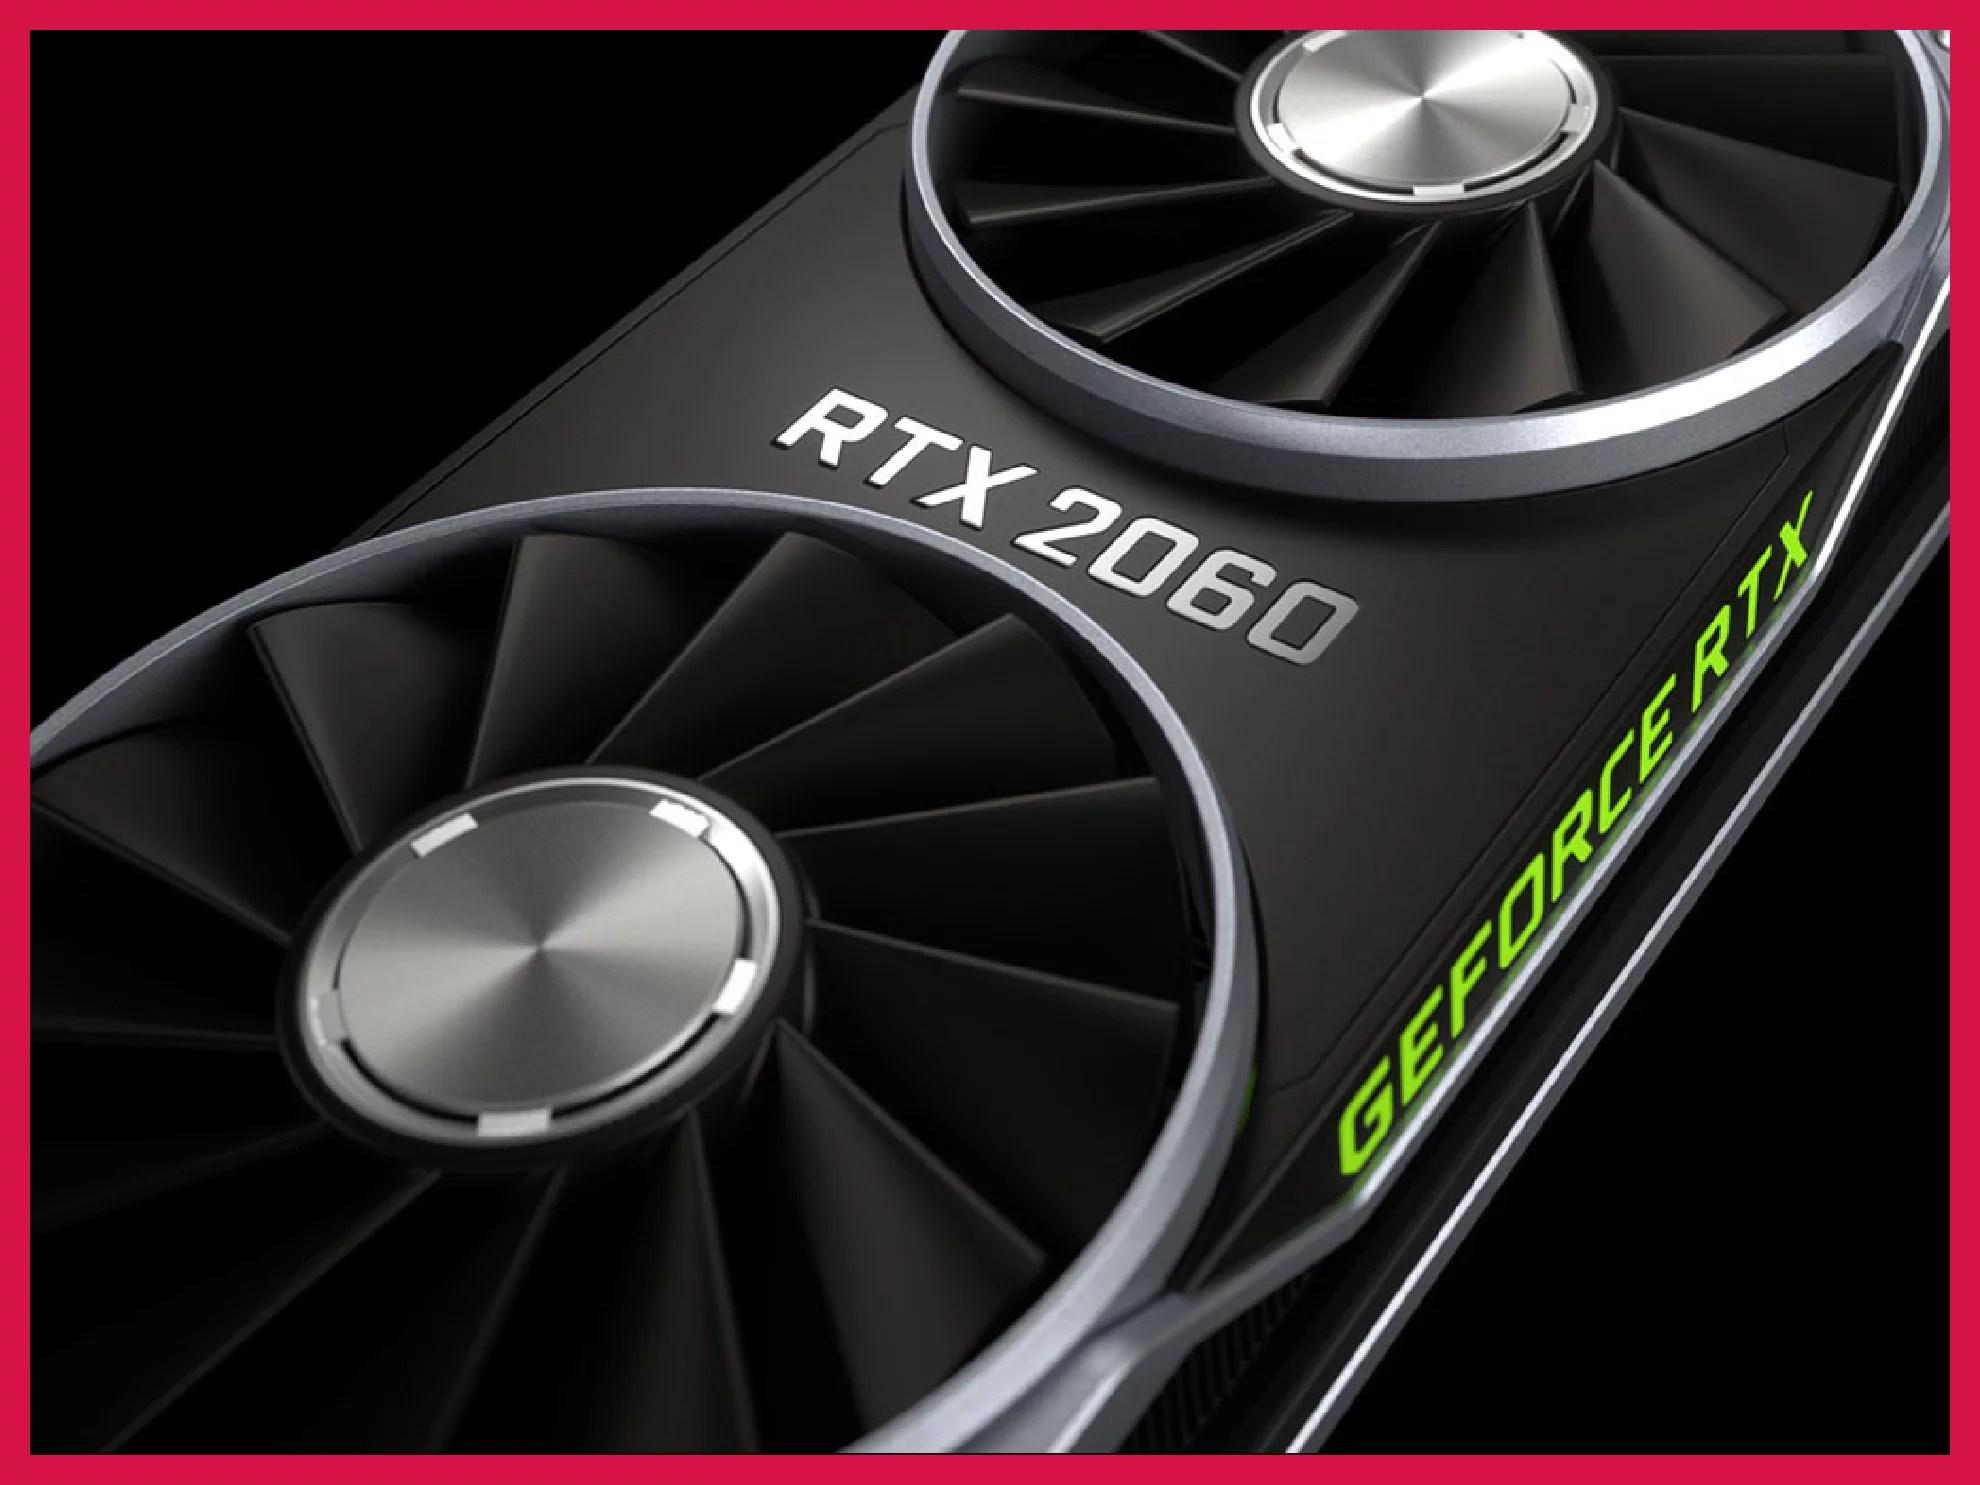 rtx 2060 ray tracing